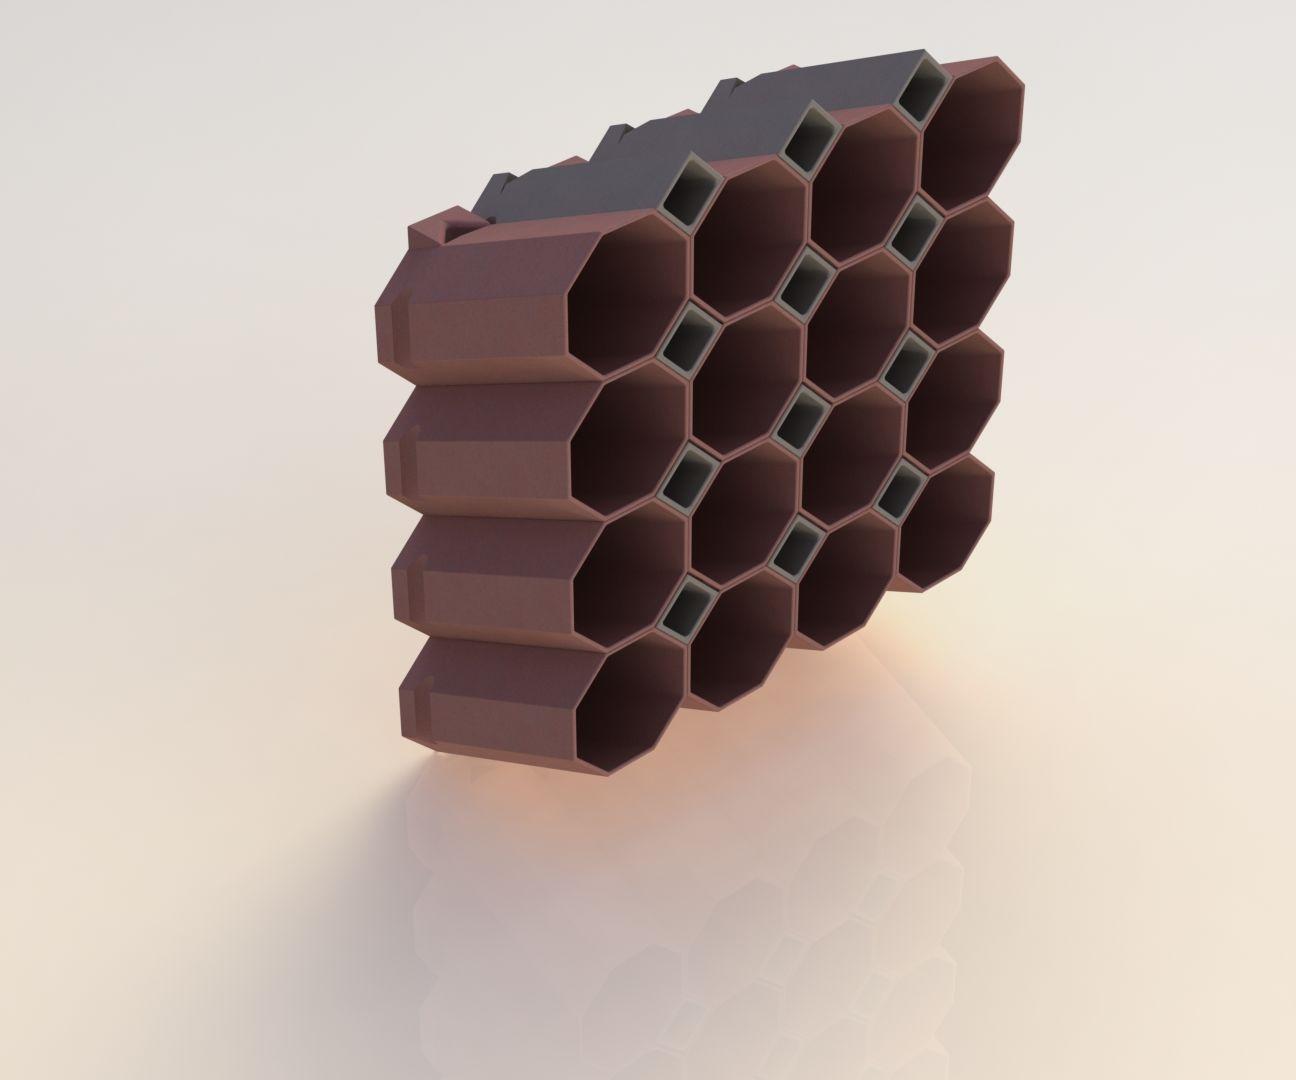 Stackable Pots